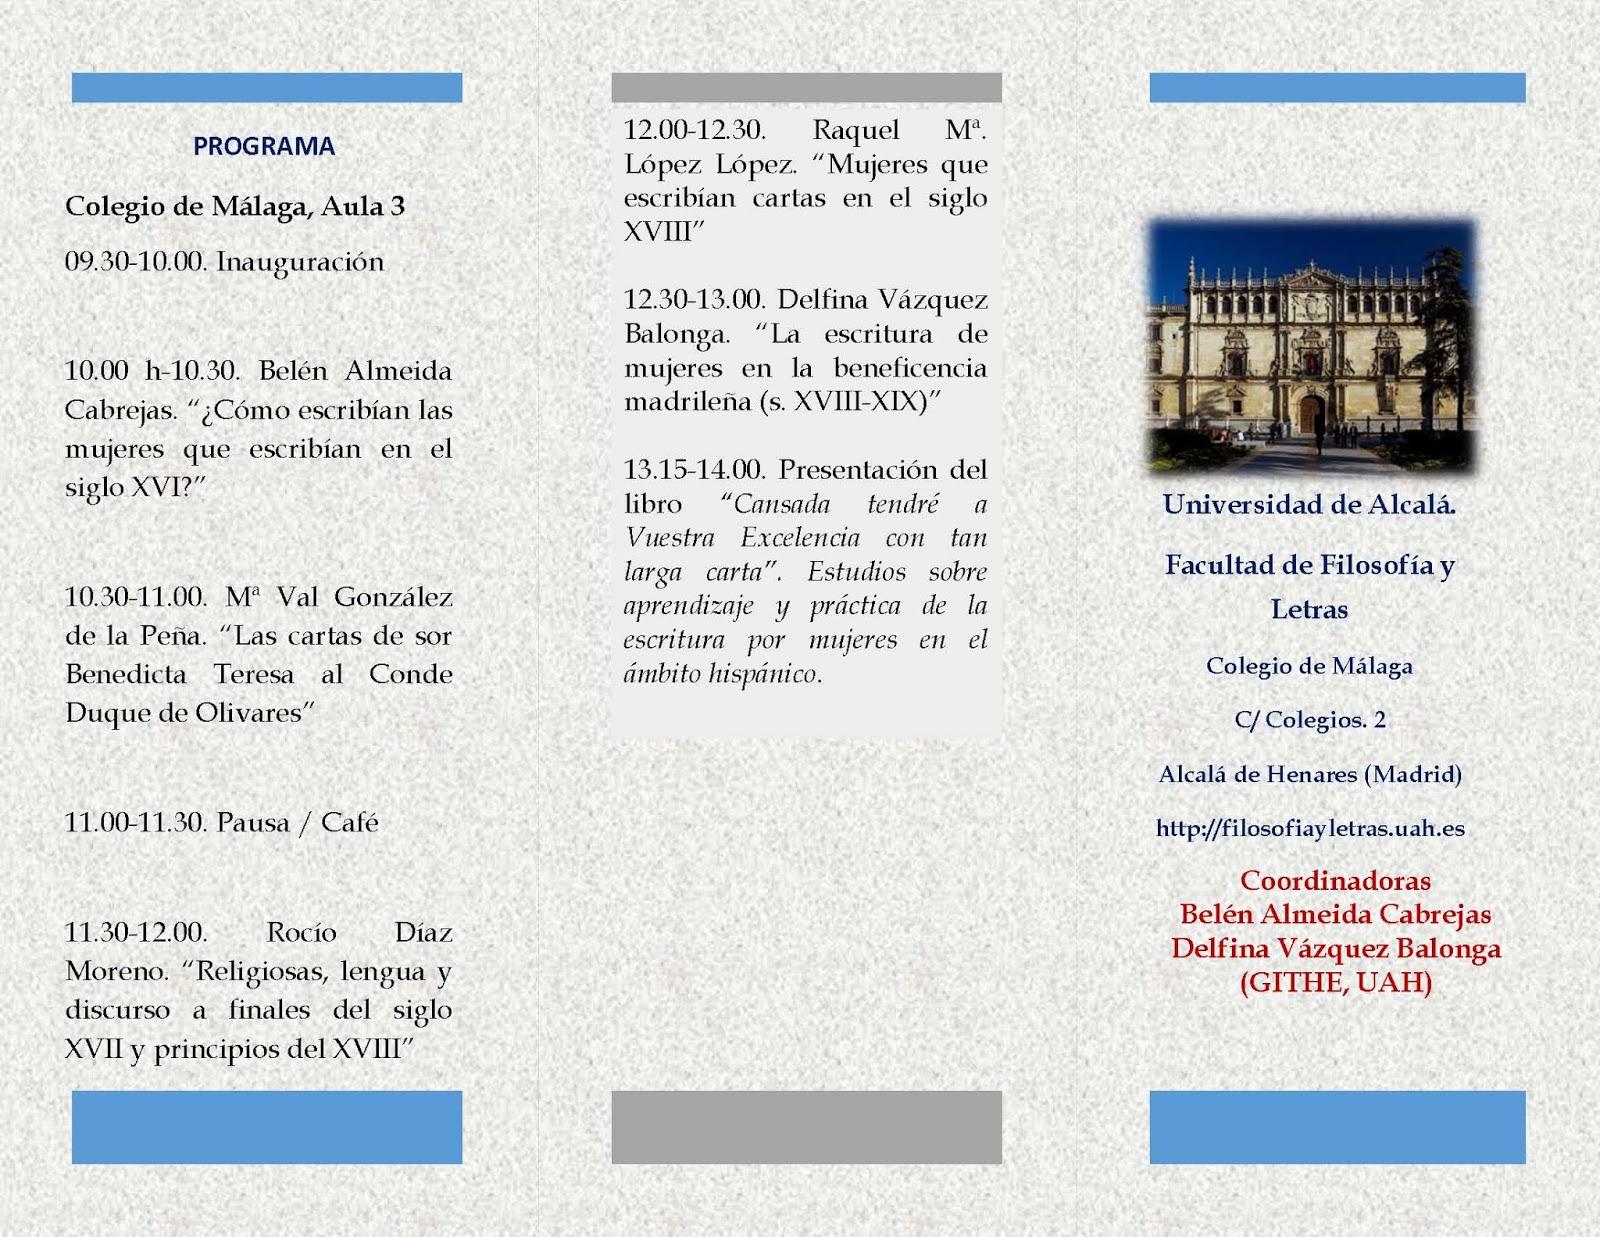 Asombroso Carta De Presentación Reanudar Formato Pdf Colección de ...